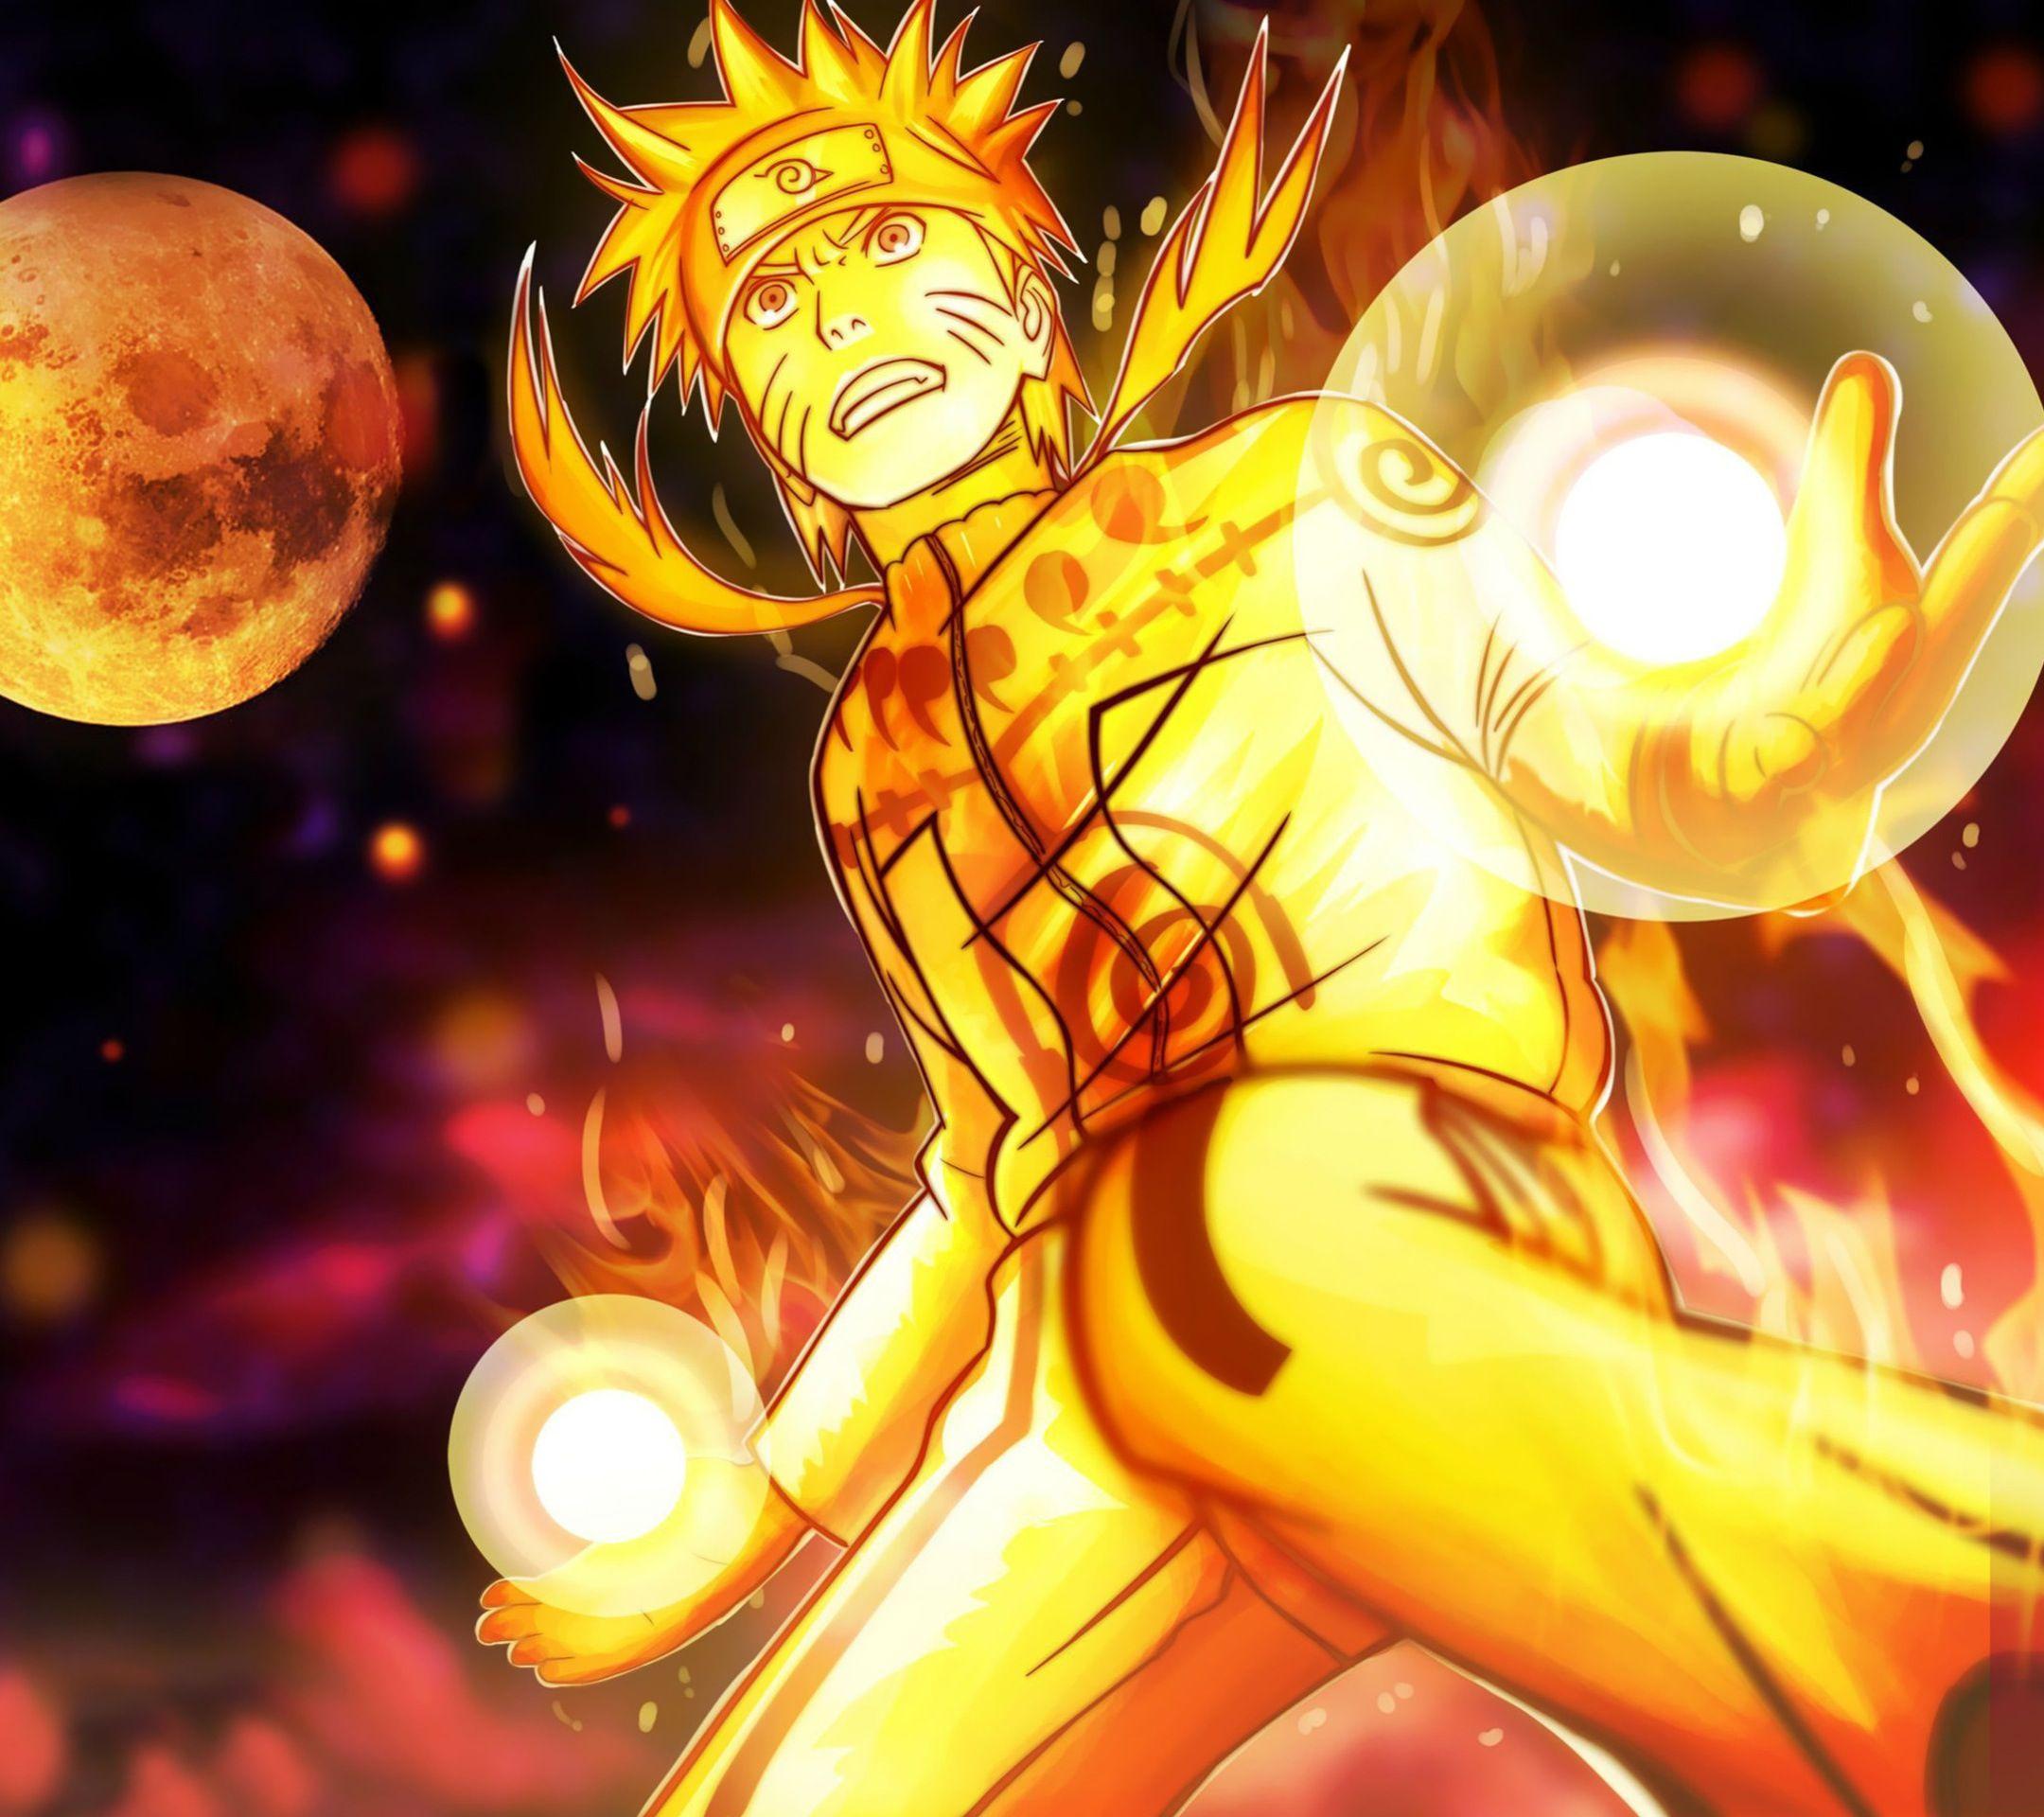 Took A While But Here39s A Shisui Wallpaper Naruto Fondos De